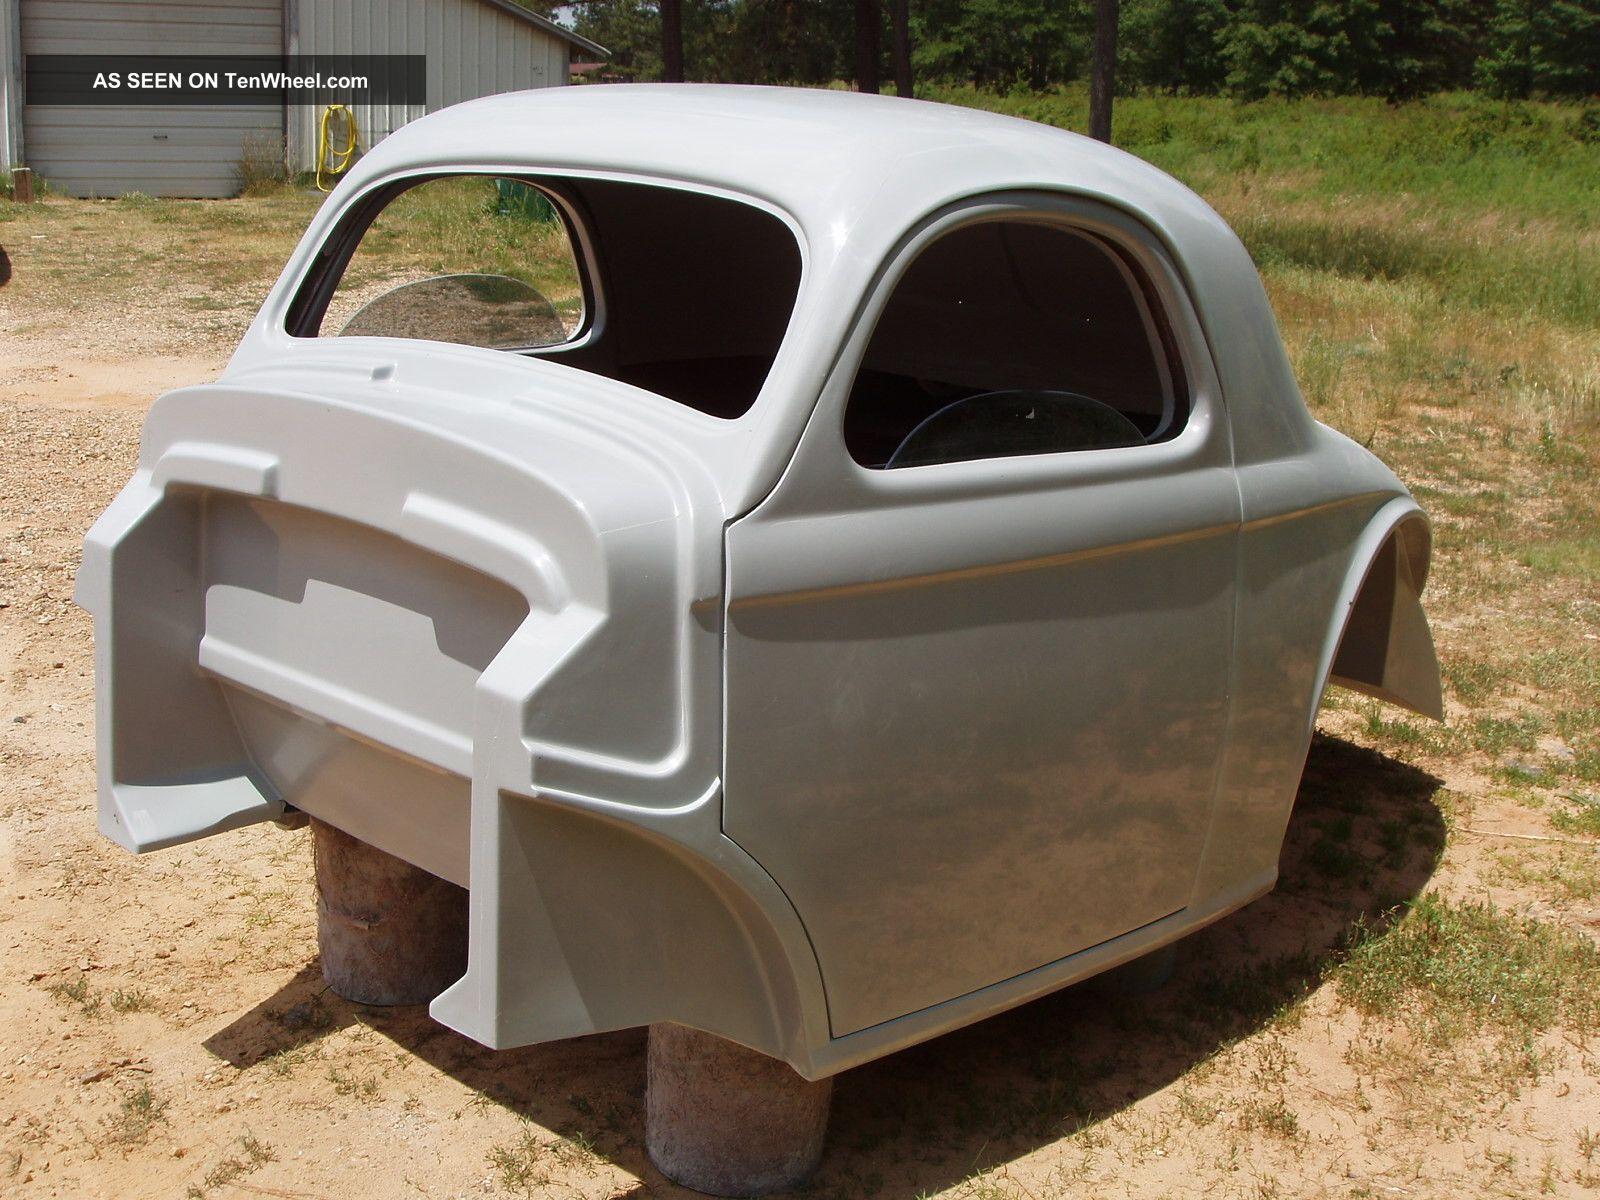 1932 ford fiberglass roadster body hot rod street rod rat rod kit car